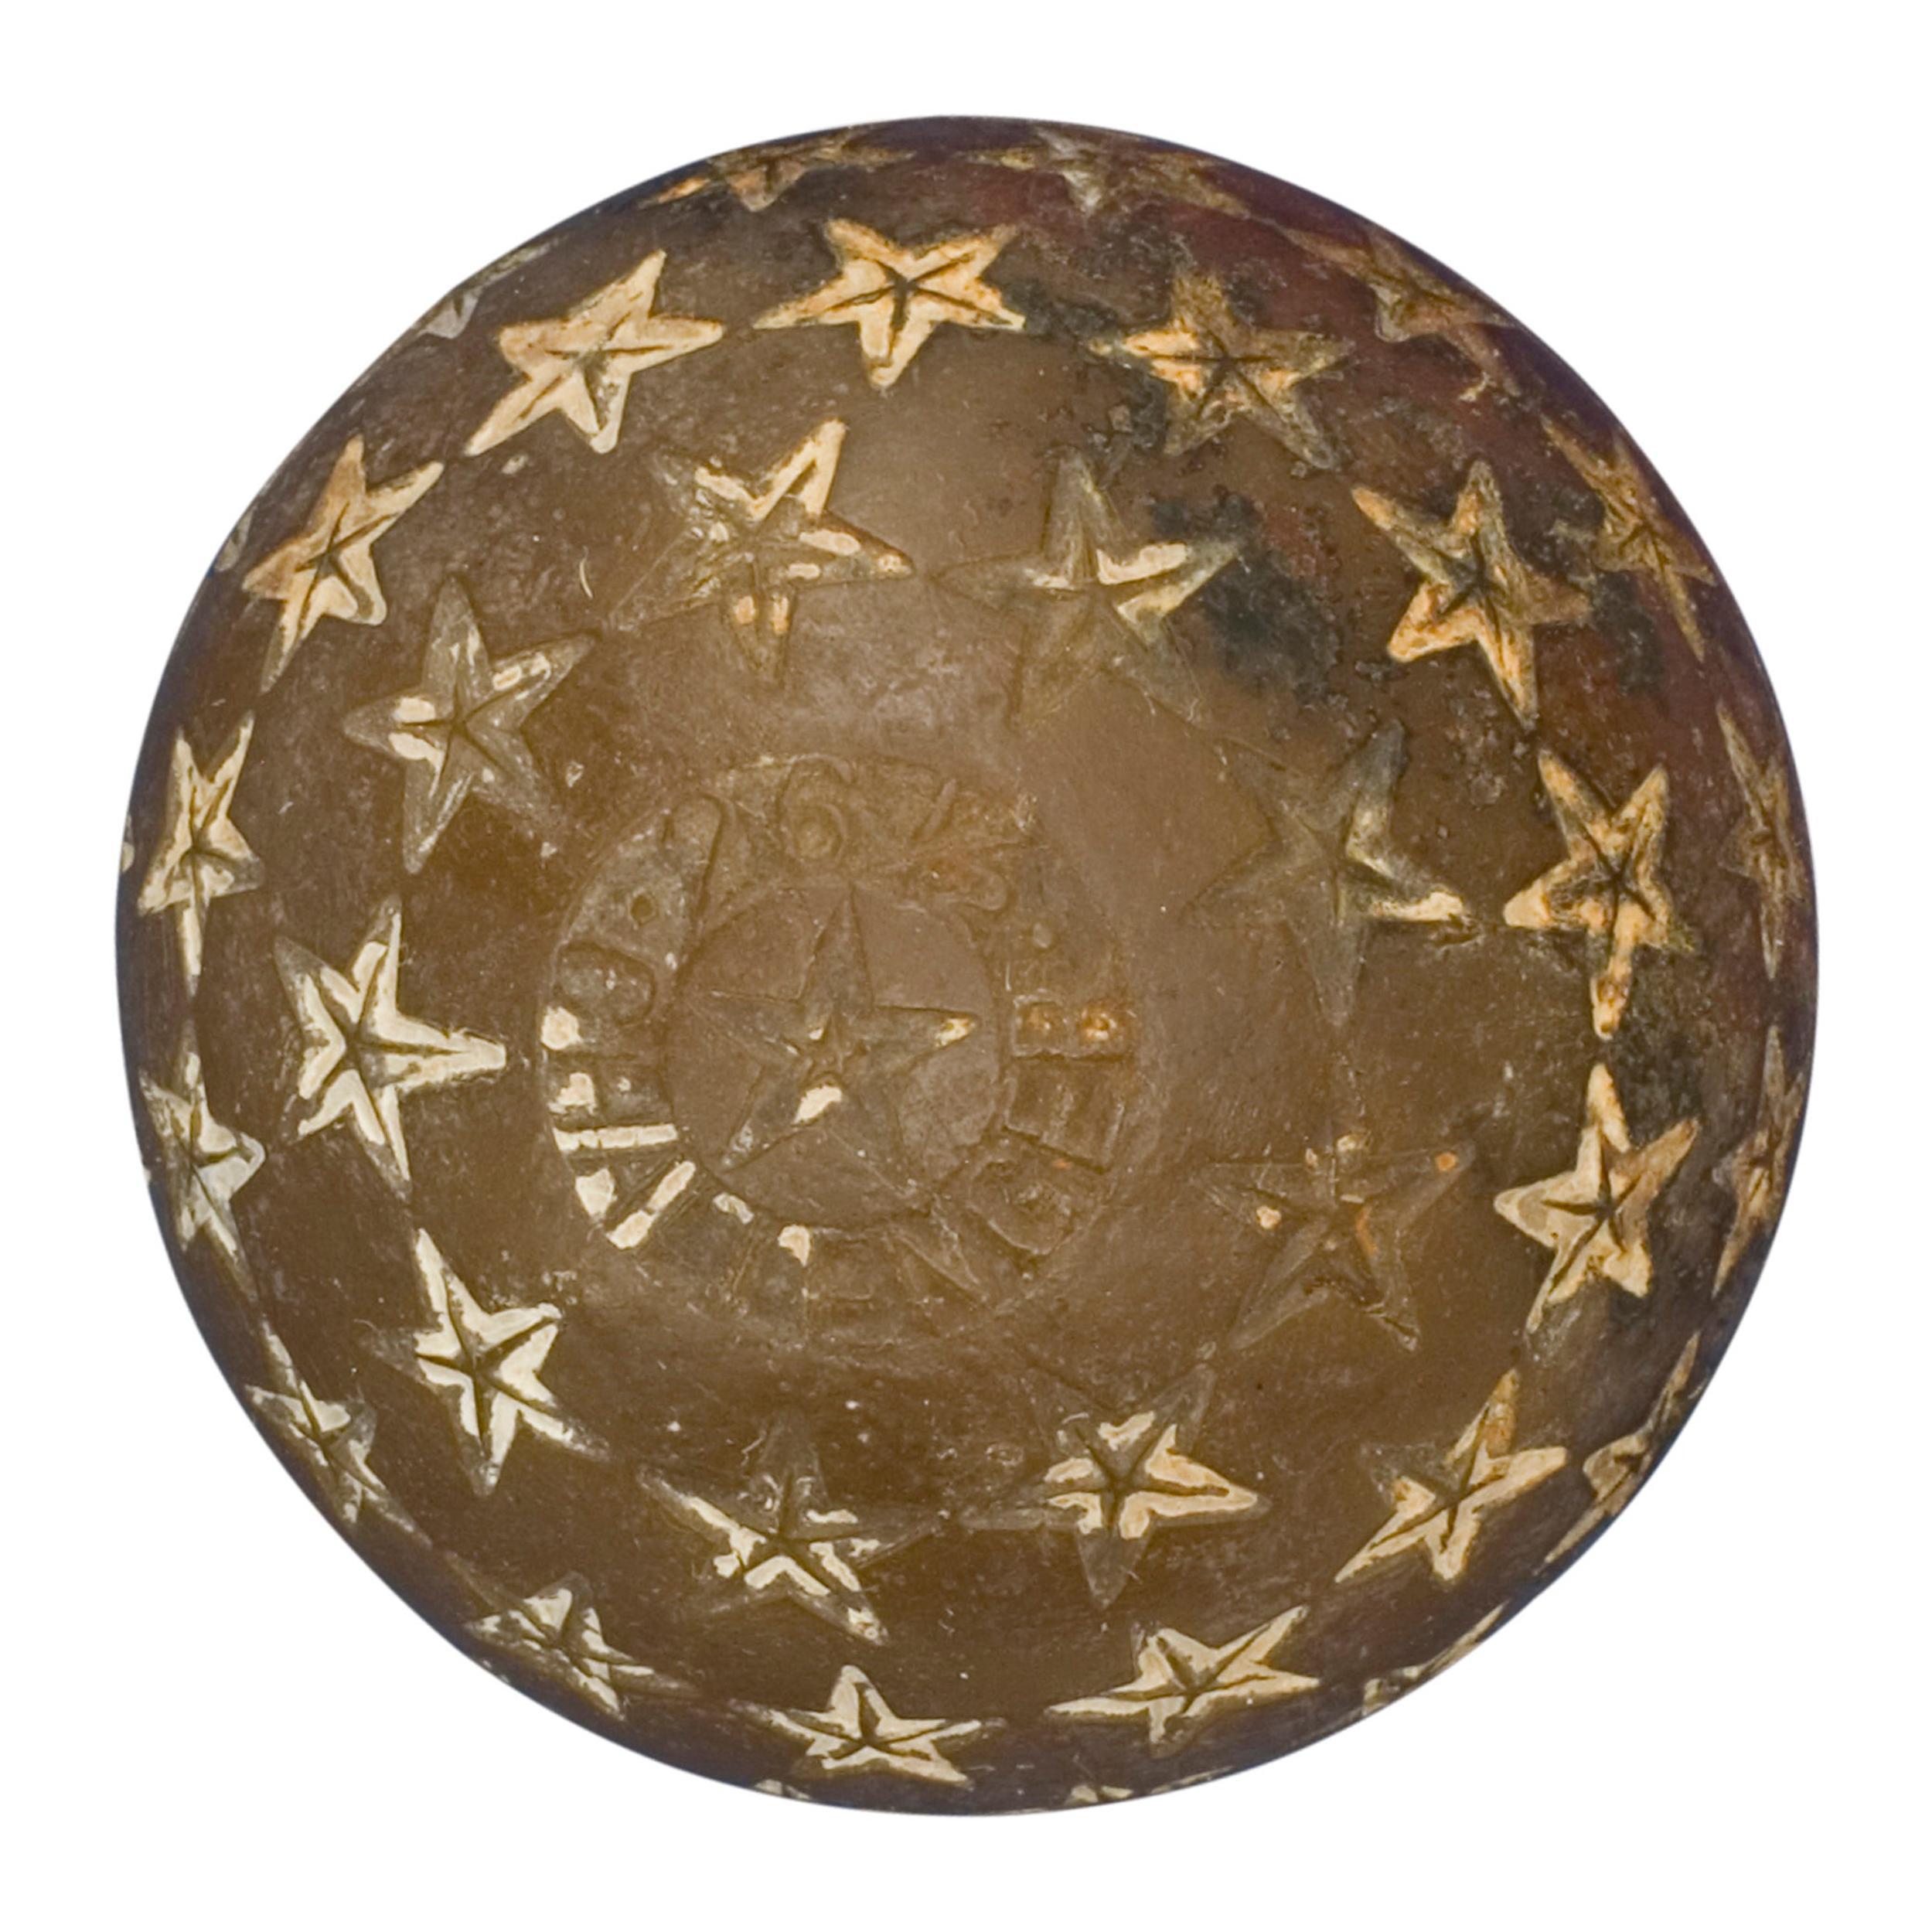 Vintage Golf Ball, Star Challenger Rubber Core